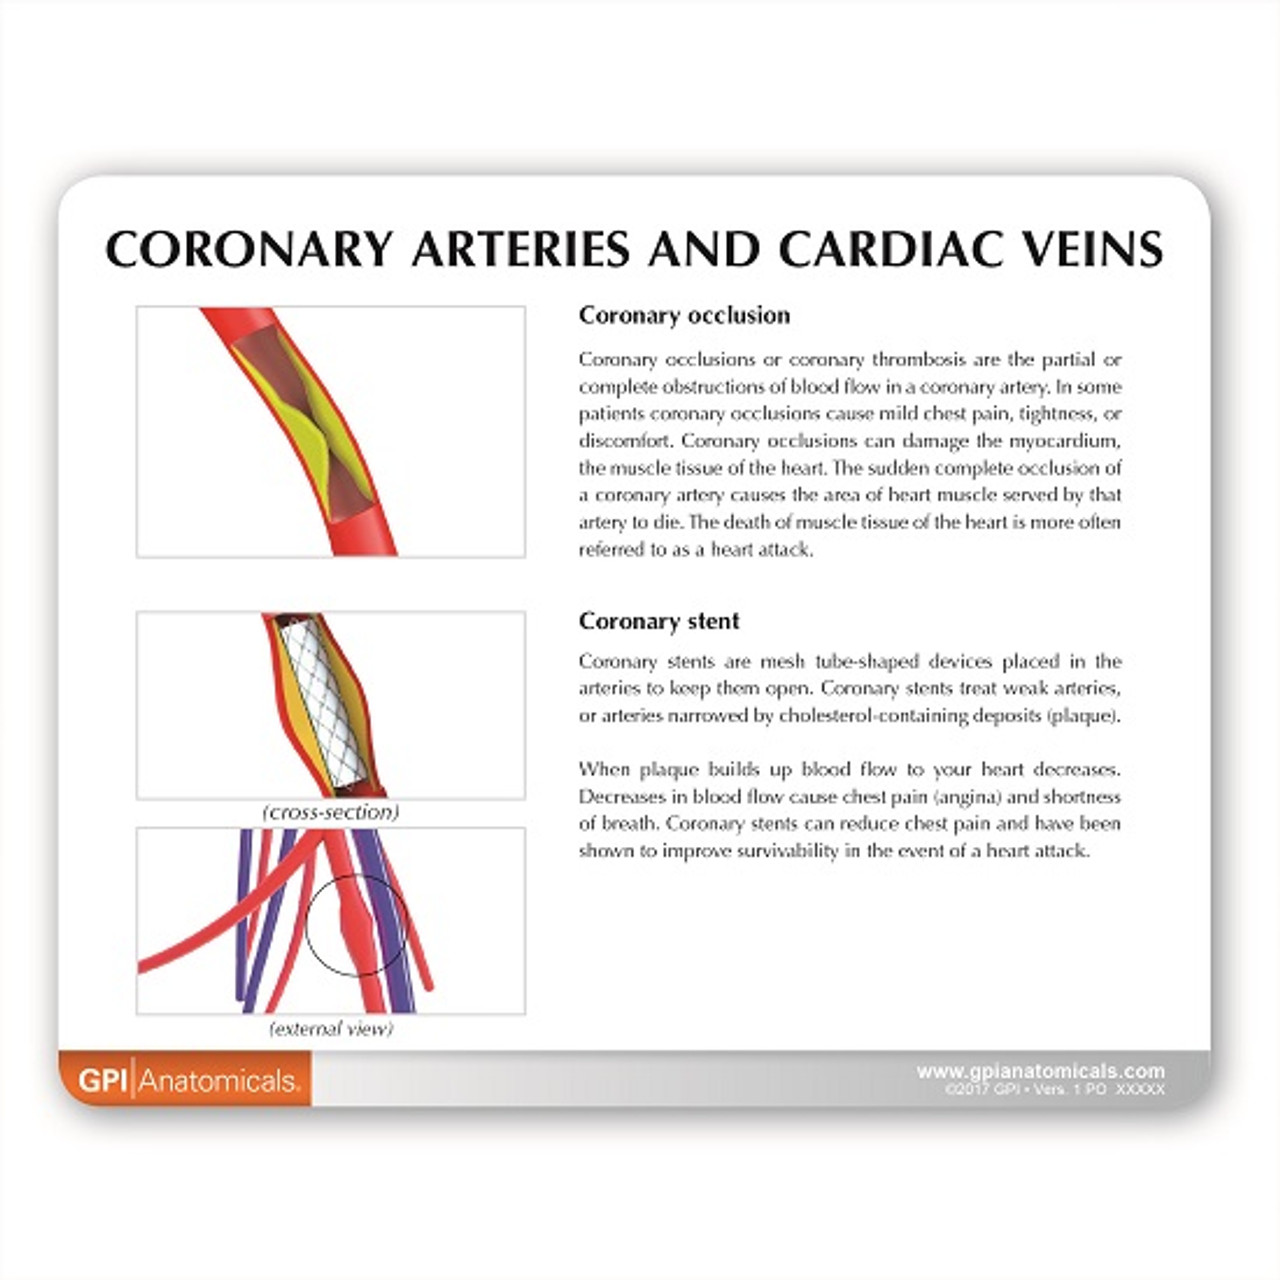 Coronary  Artery/ Cardiac Vein Description Card